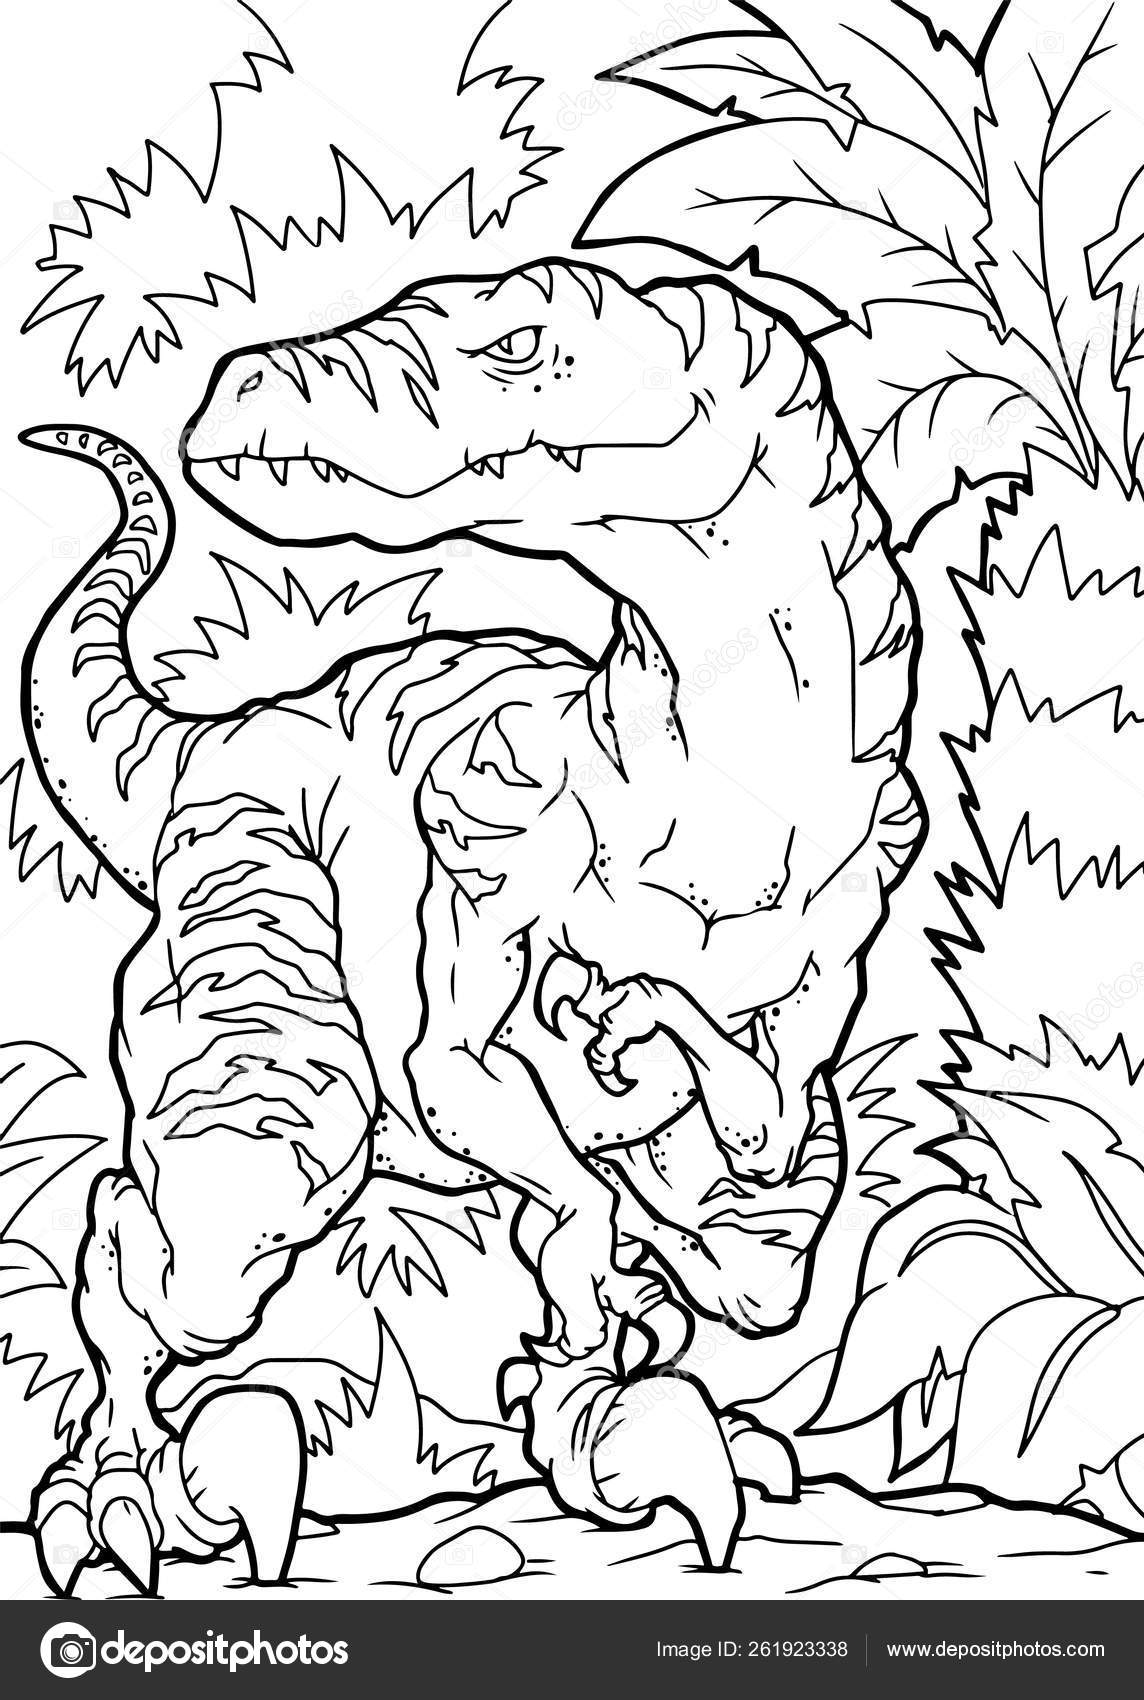 Coloring Book Velociraptor Dinosaur Coloring Page — Stock Vector ...